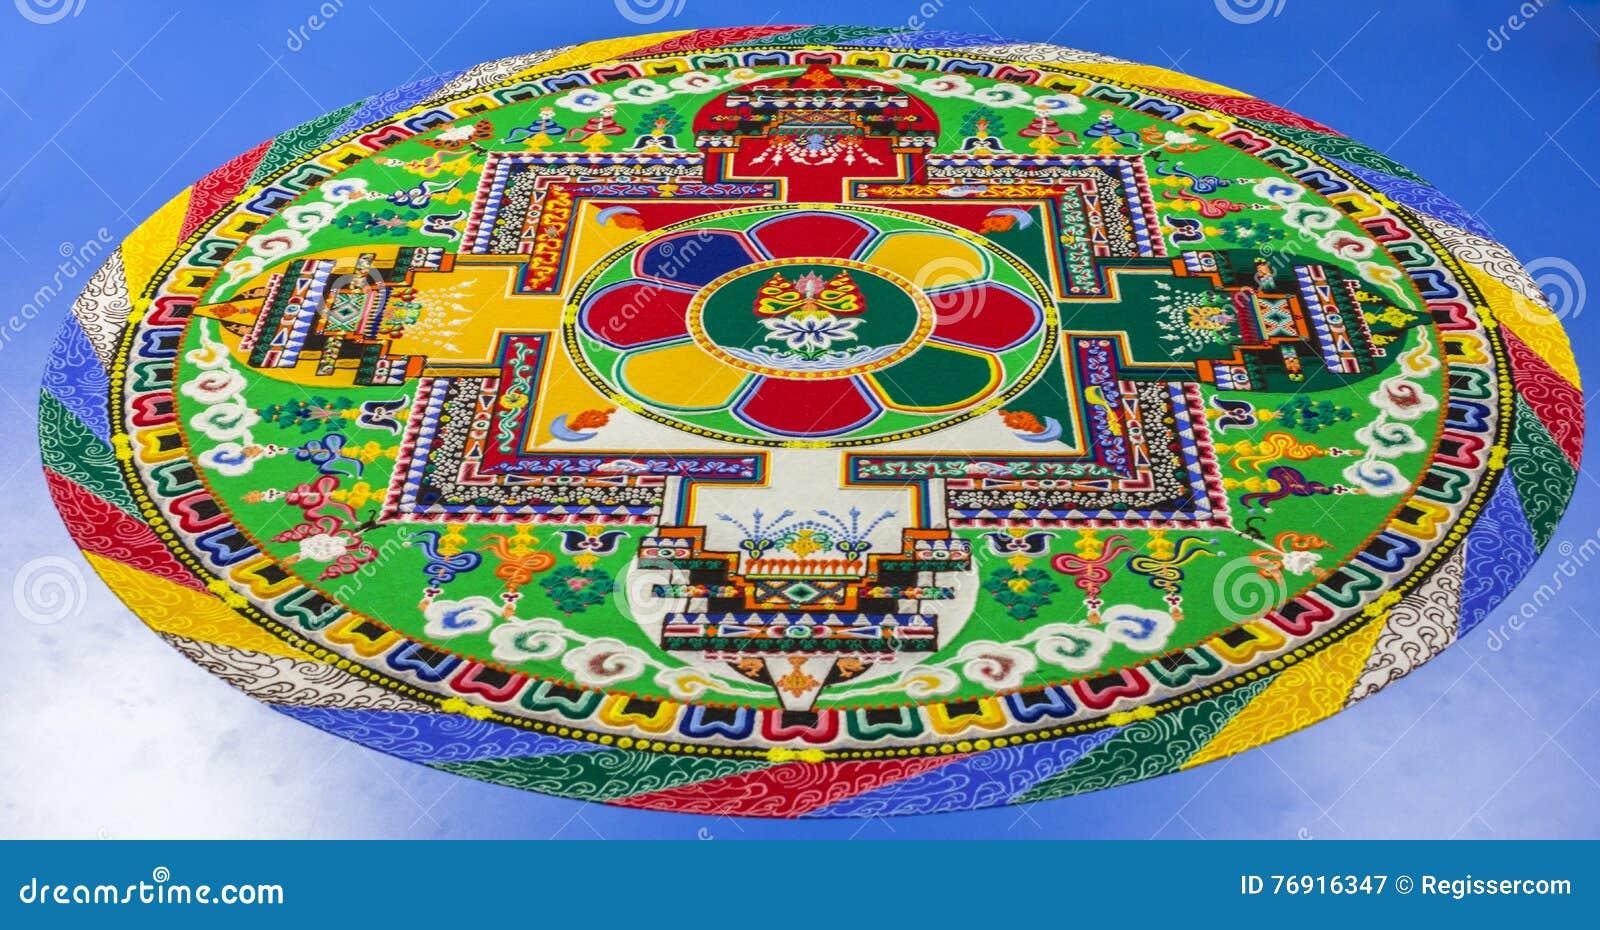 Sand mandala stock image image of sand mantra drawing 76916347 royalty free stock photo biocorpaavc Images